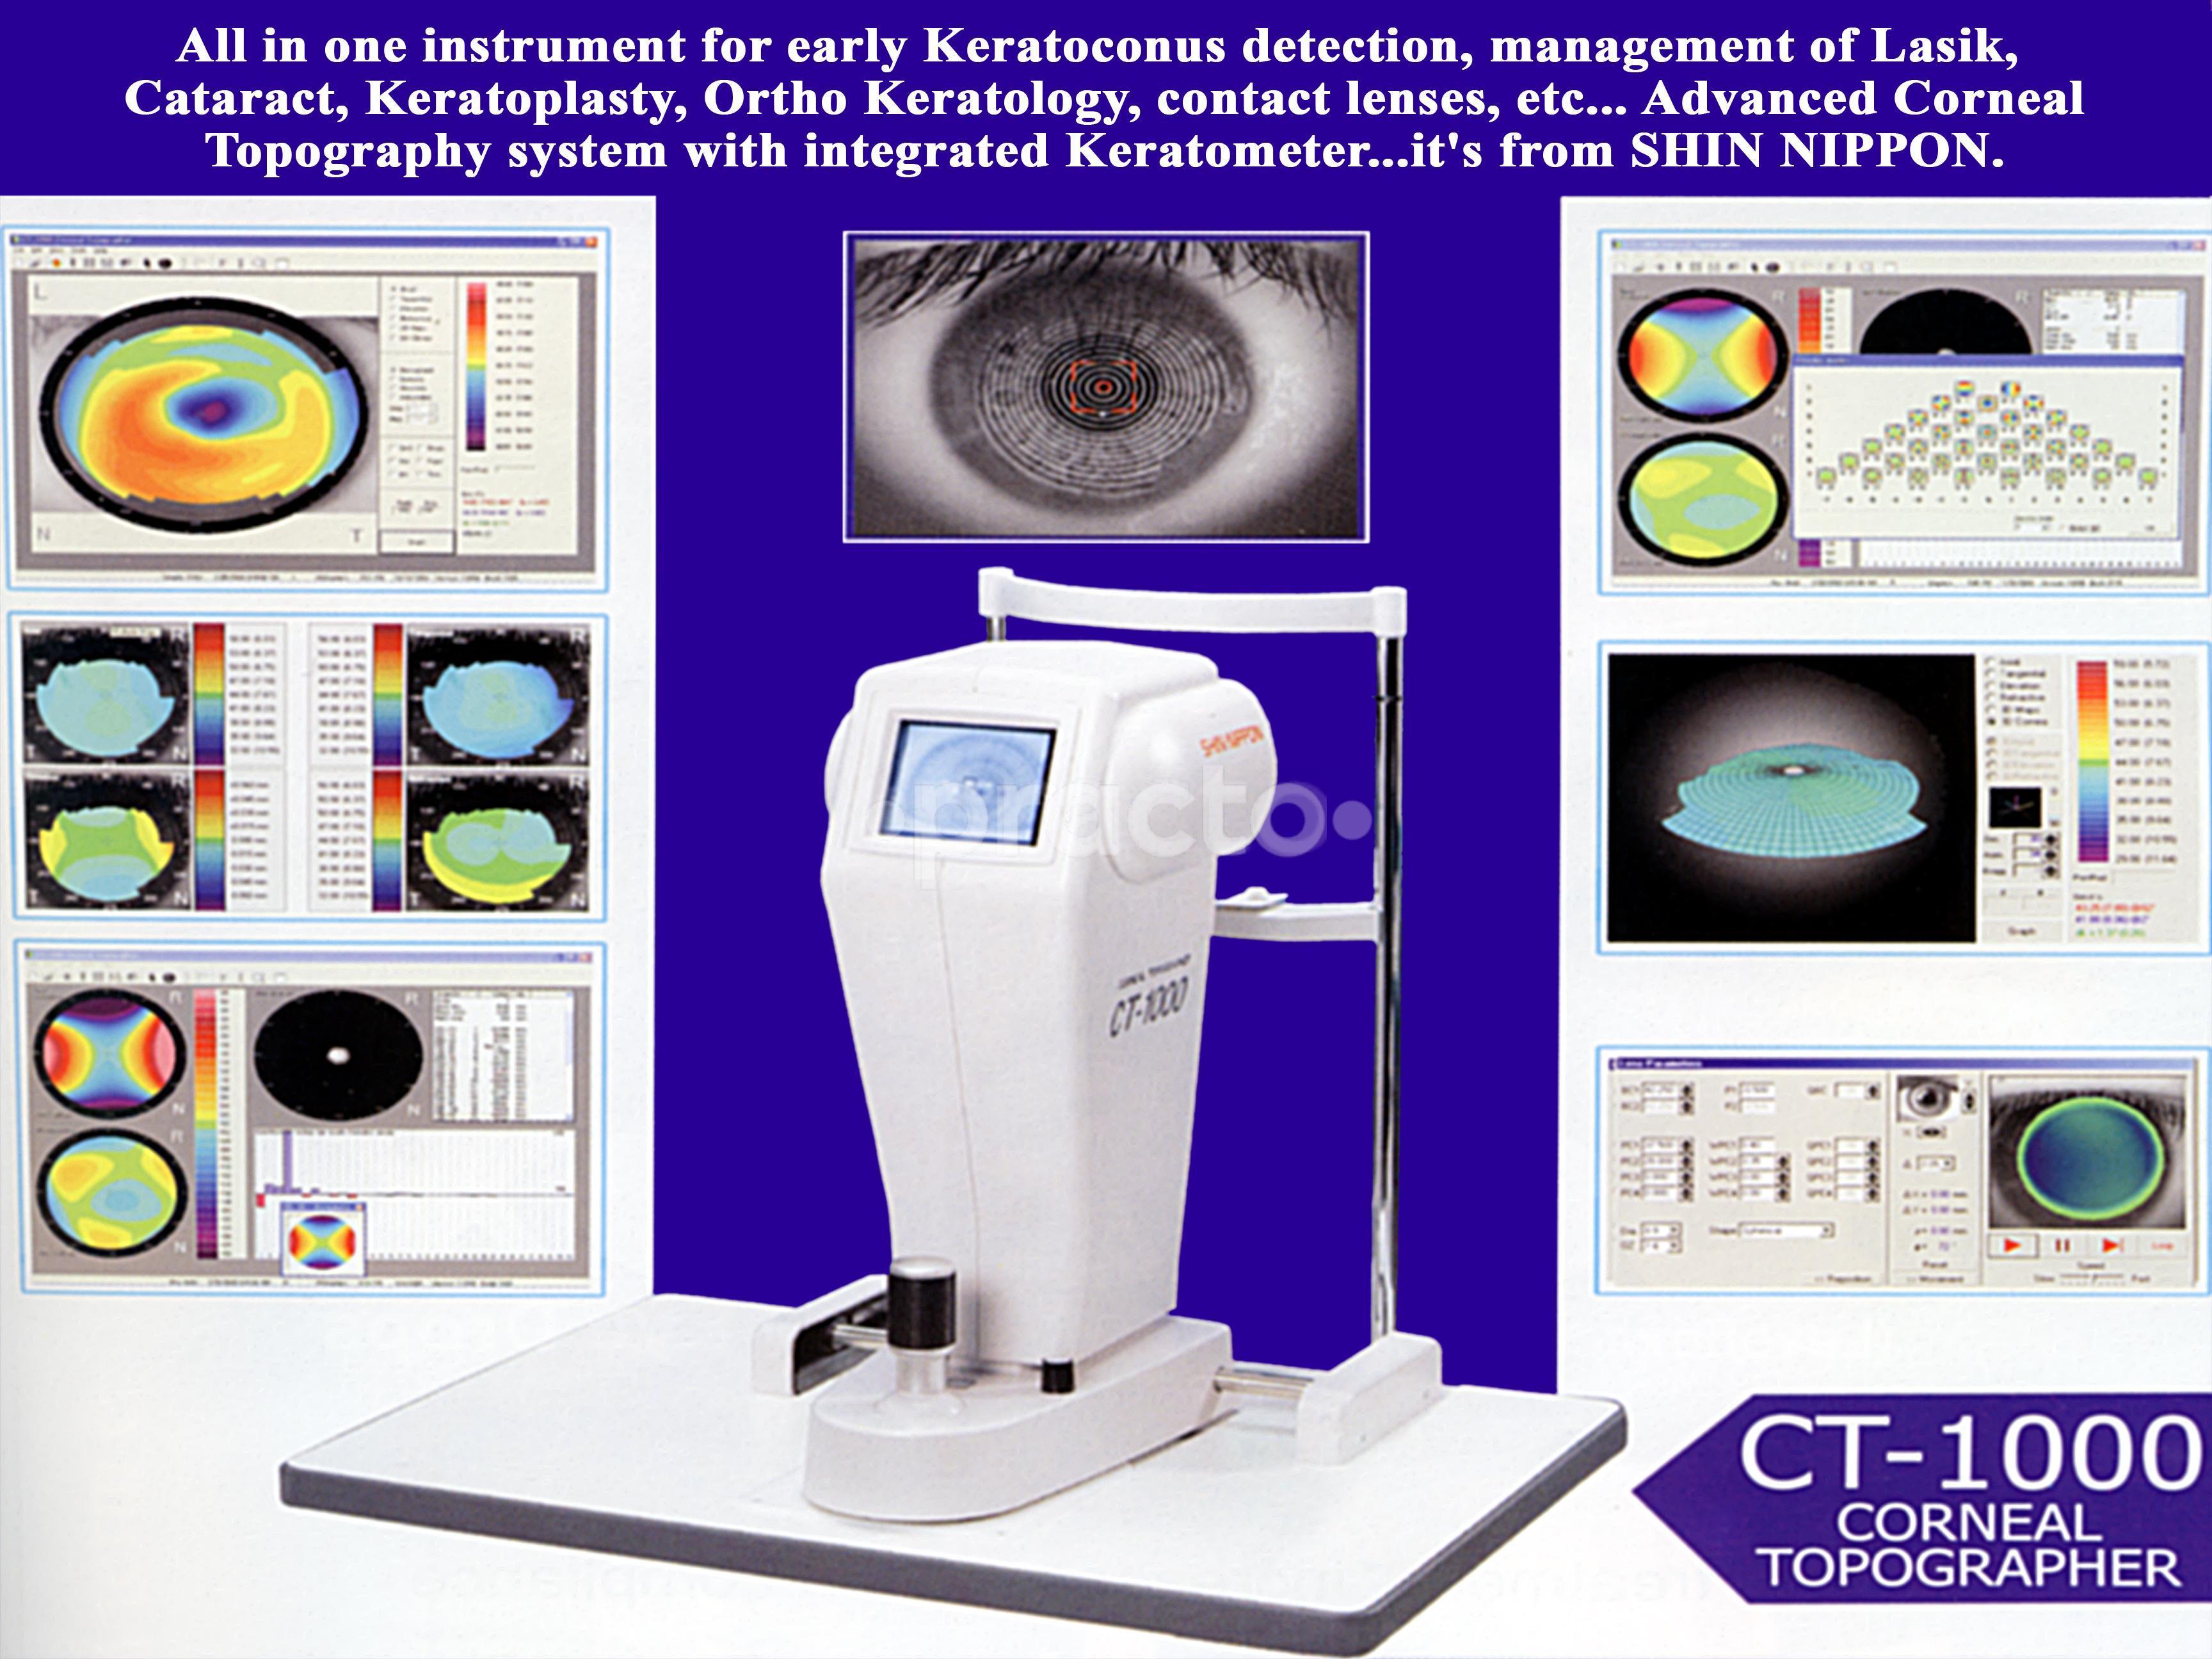 Vidya Eye Hospital, Eye Hospital in Vijayanagar, Bangalore